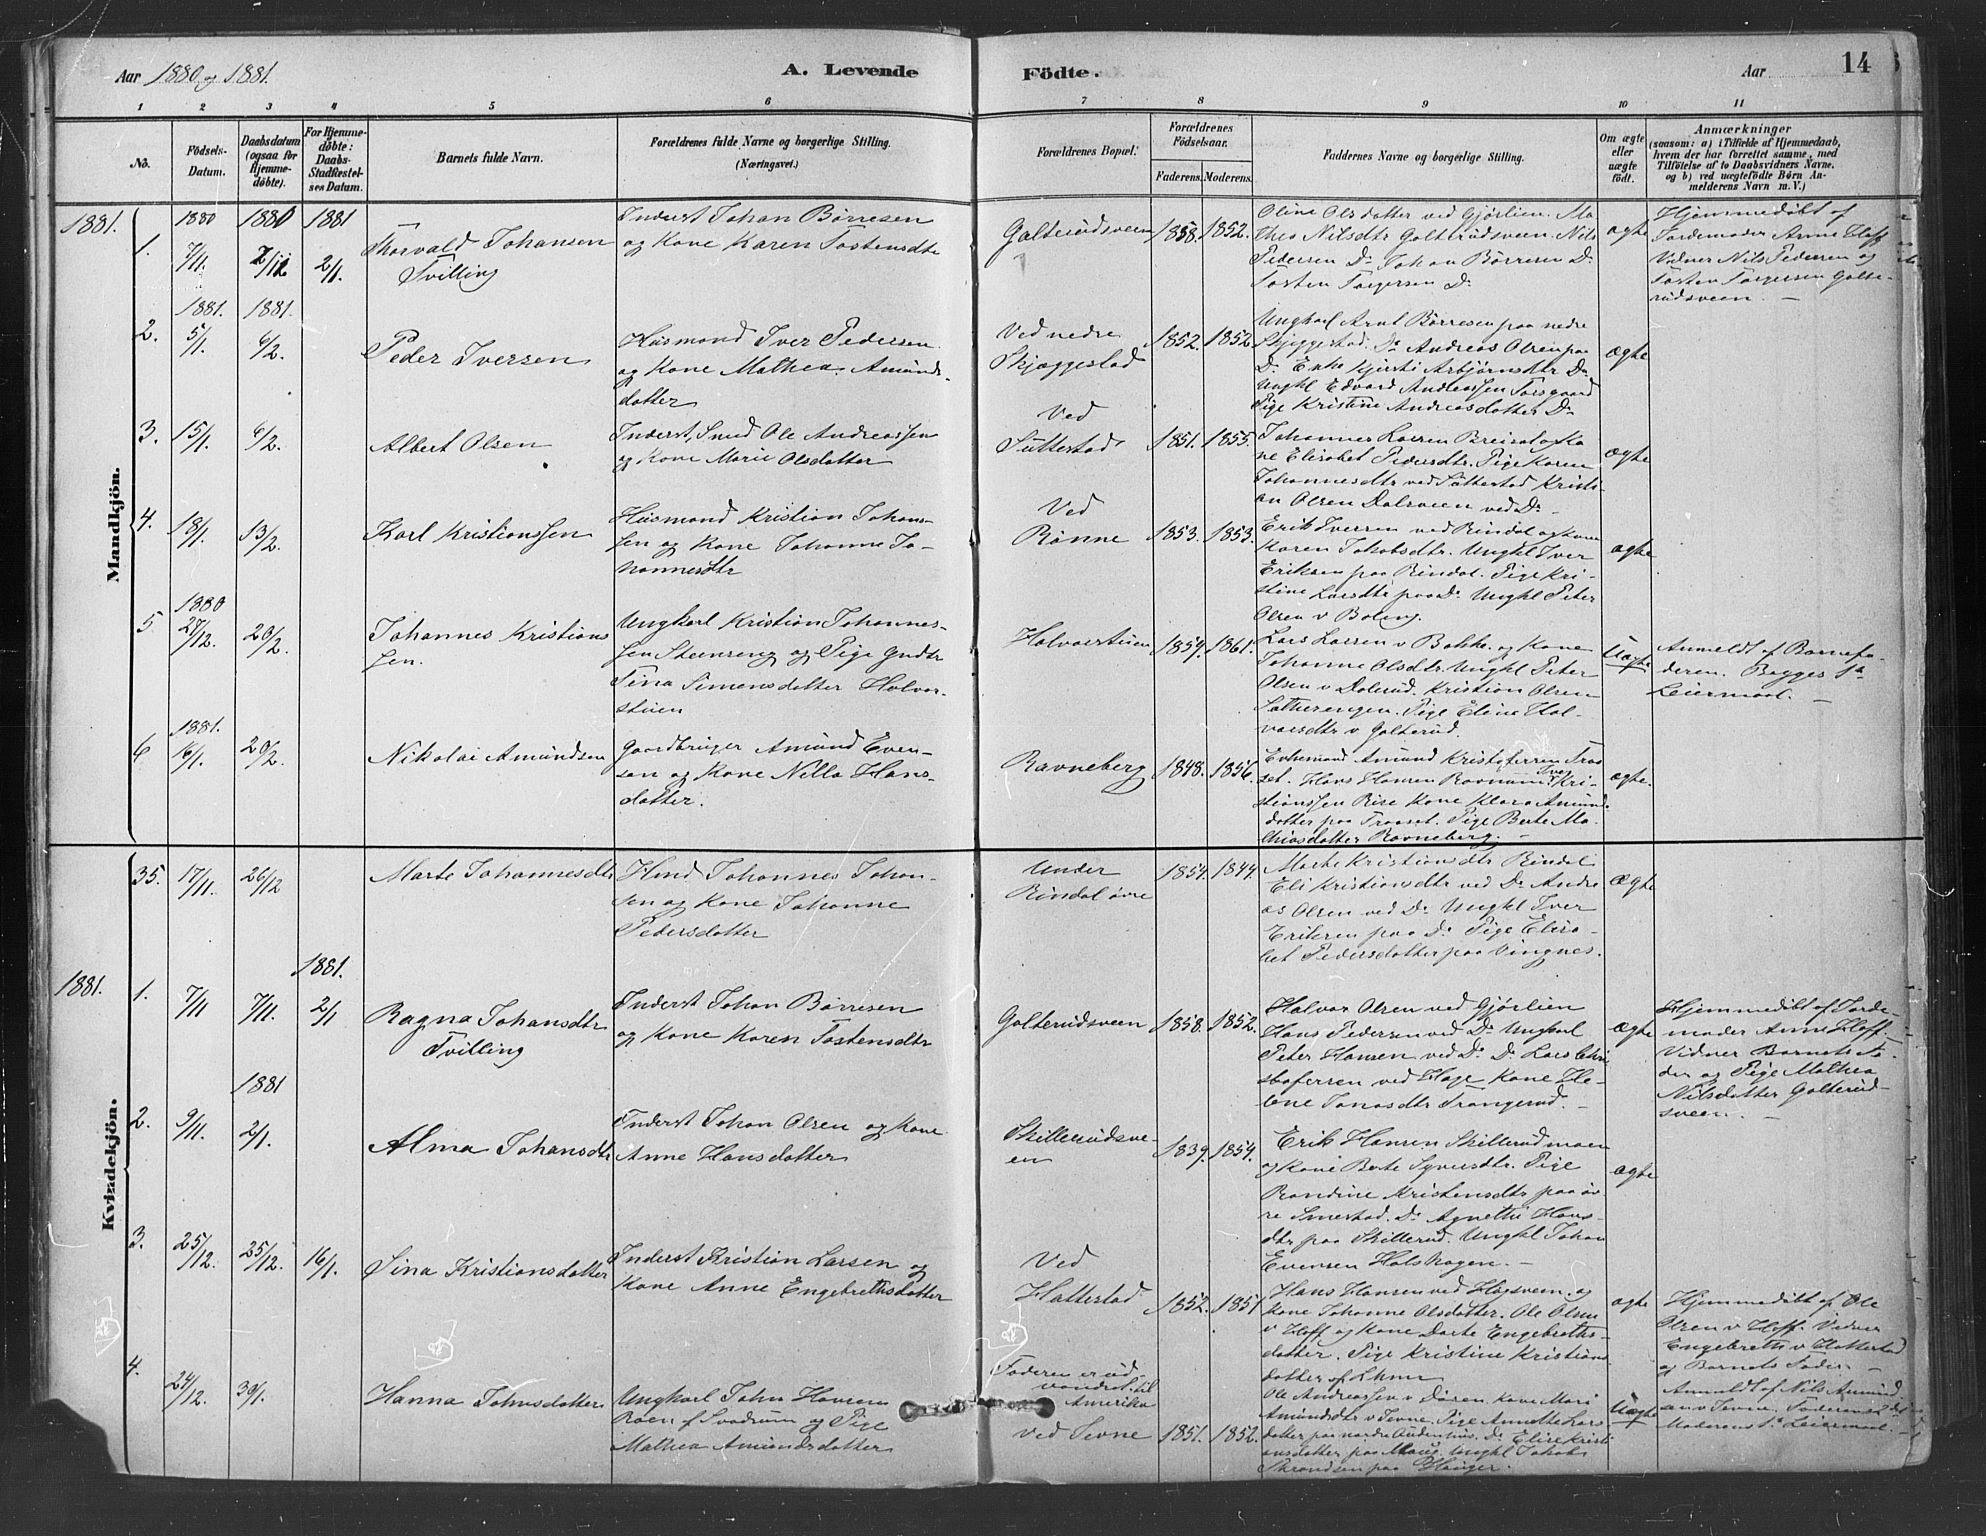 SAH, Fåberg prestekontor, Ministerialbok nr. 9, 1879-1898, s. 14